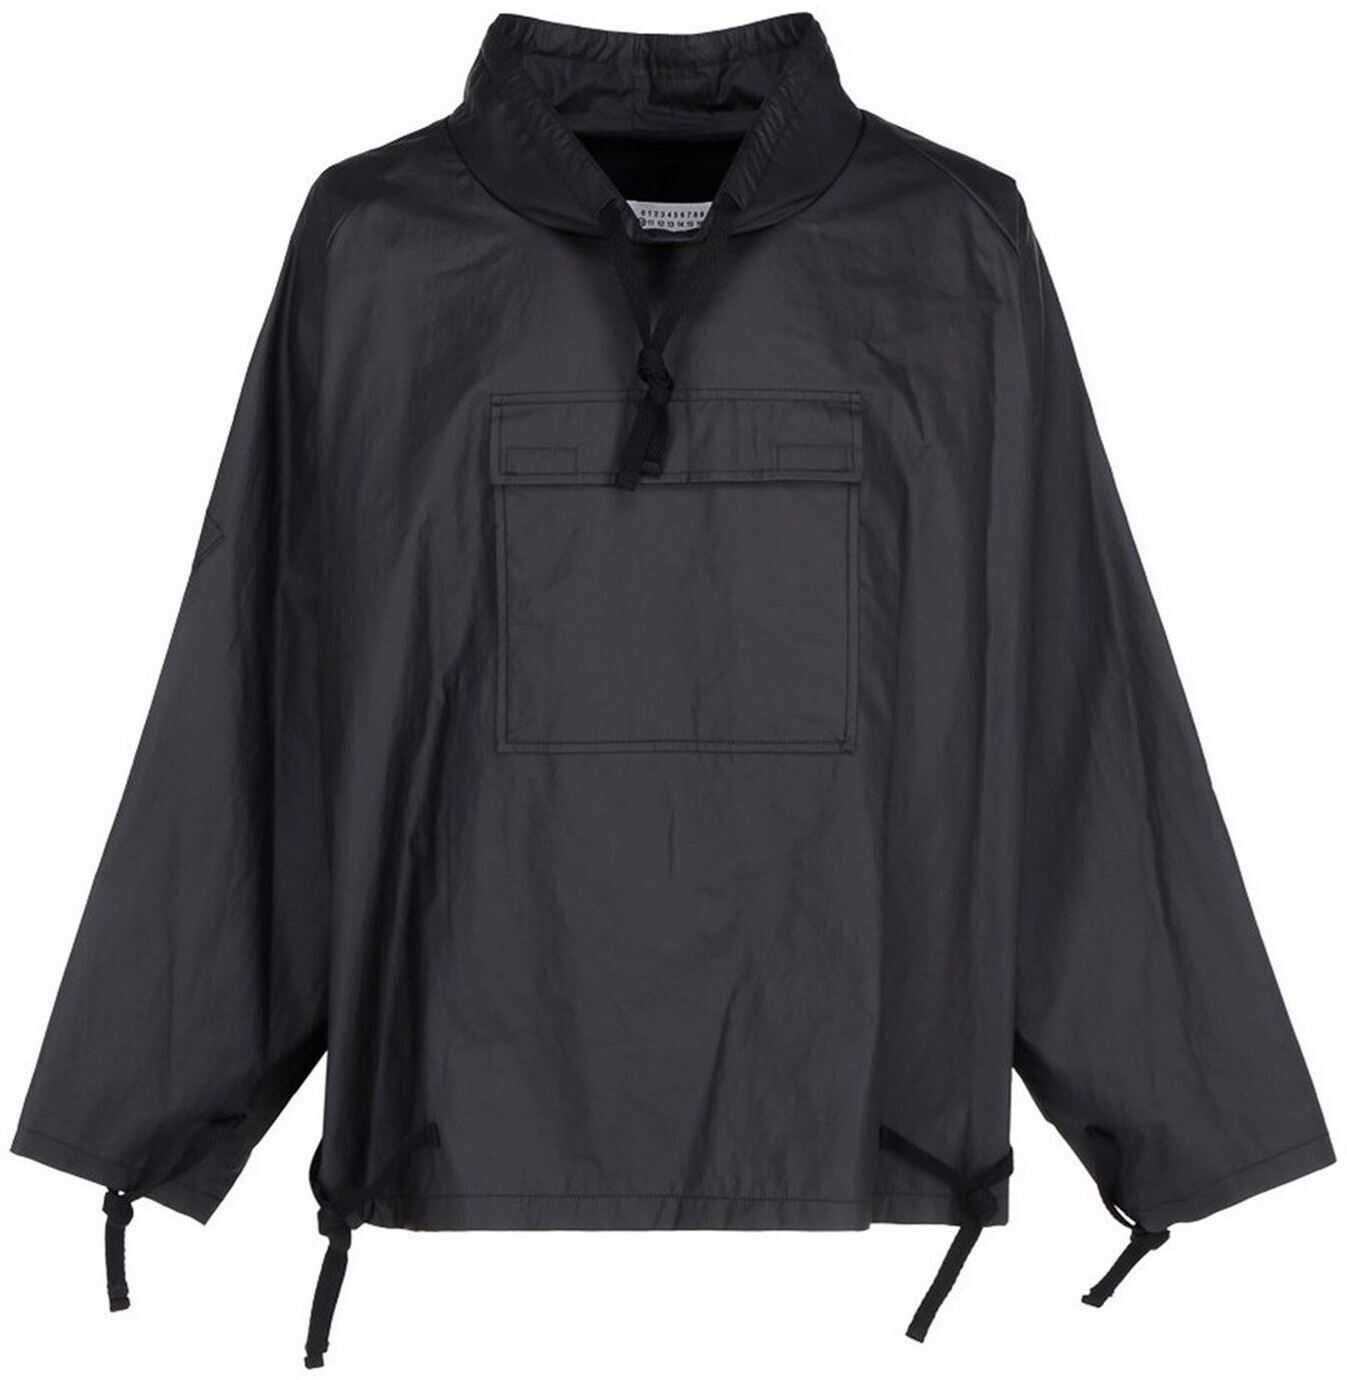 Maison Margiela Ramie Pullover Jacket In Black Black imagine